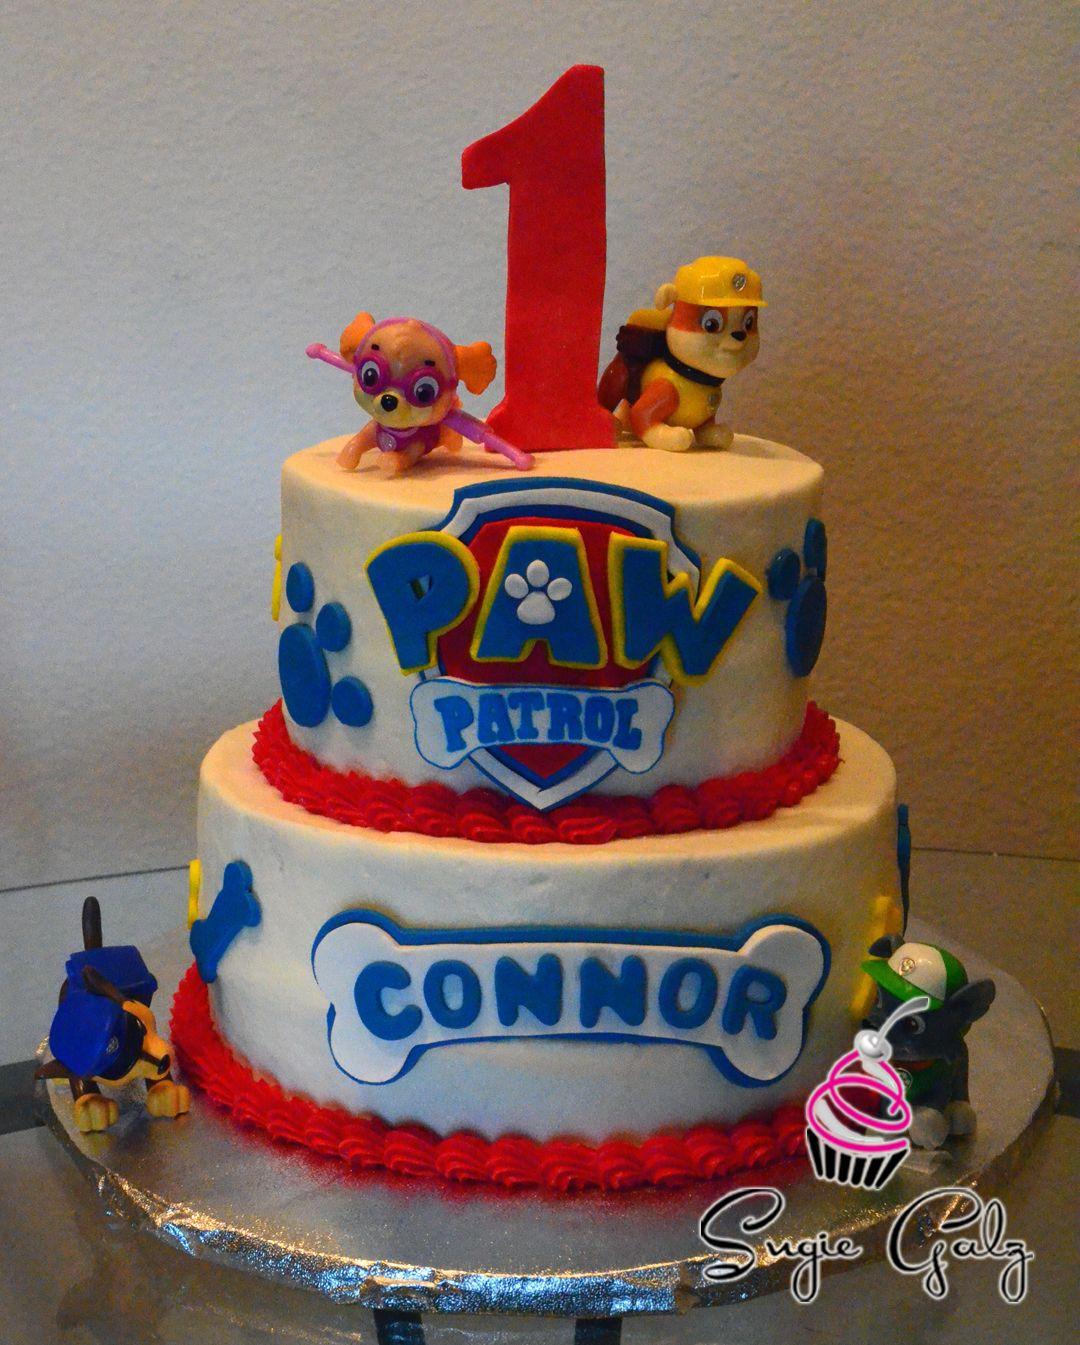 Paw Patrol First Birthday Cake by Sugie Galz in Austin Texas Party